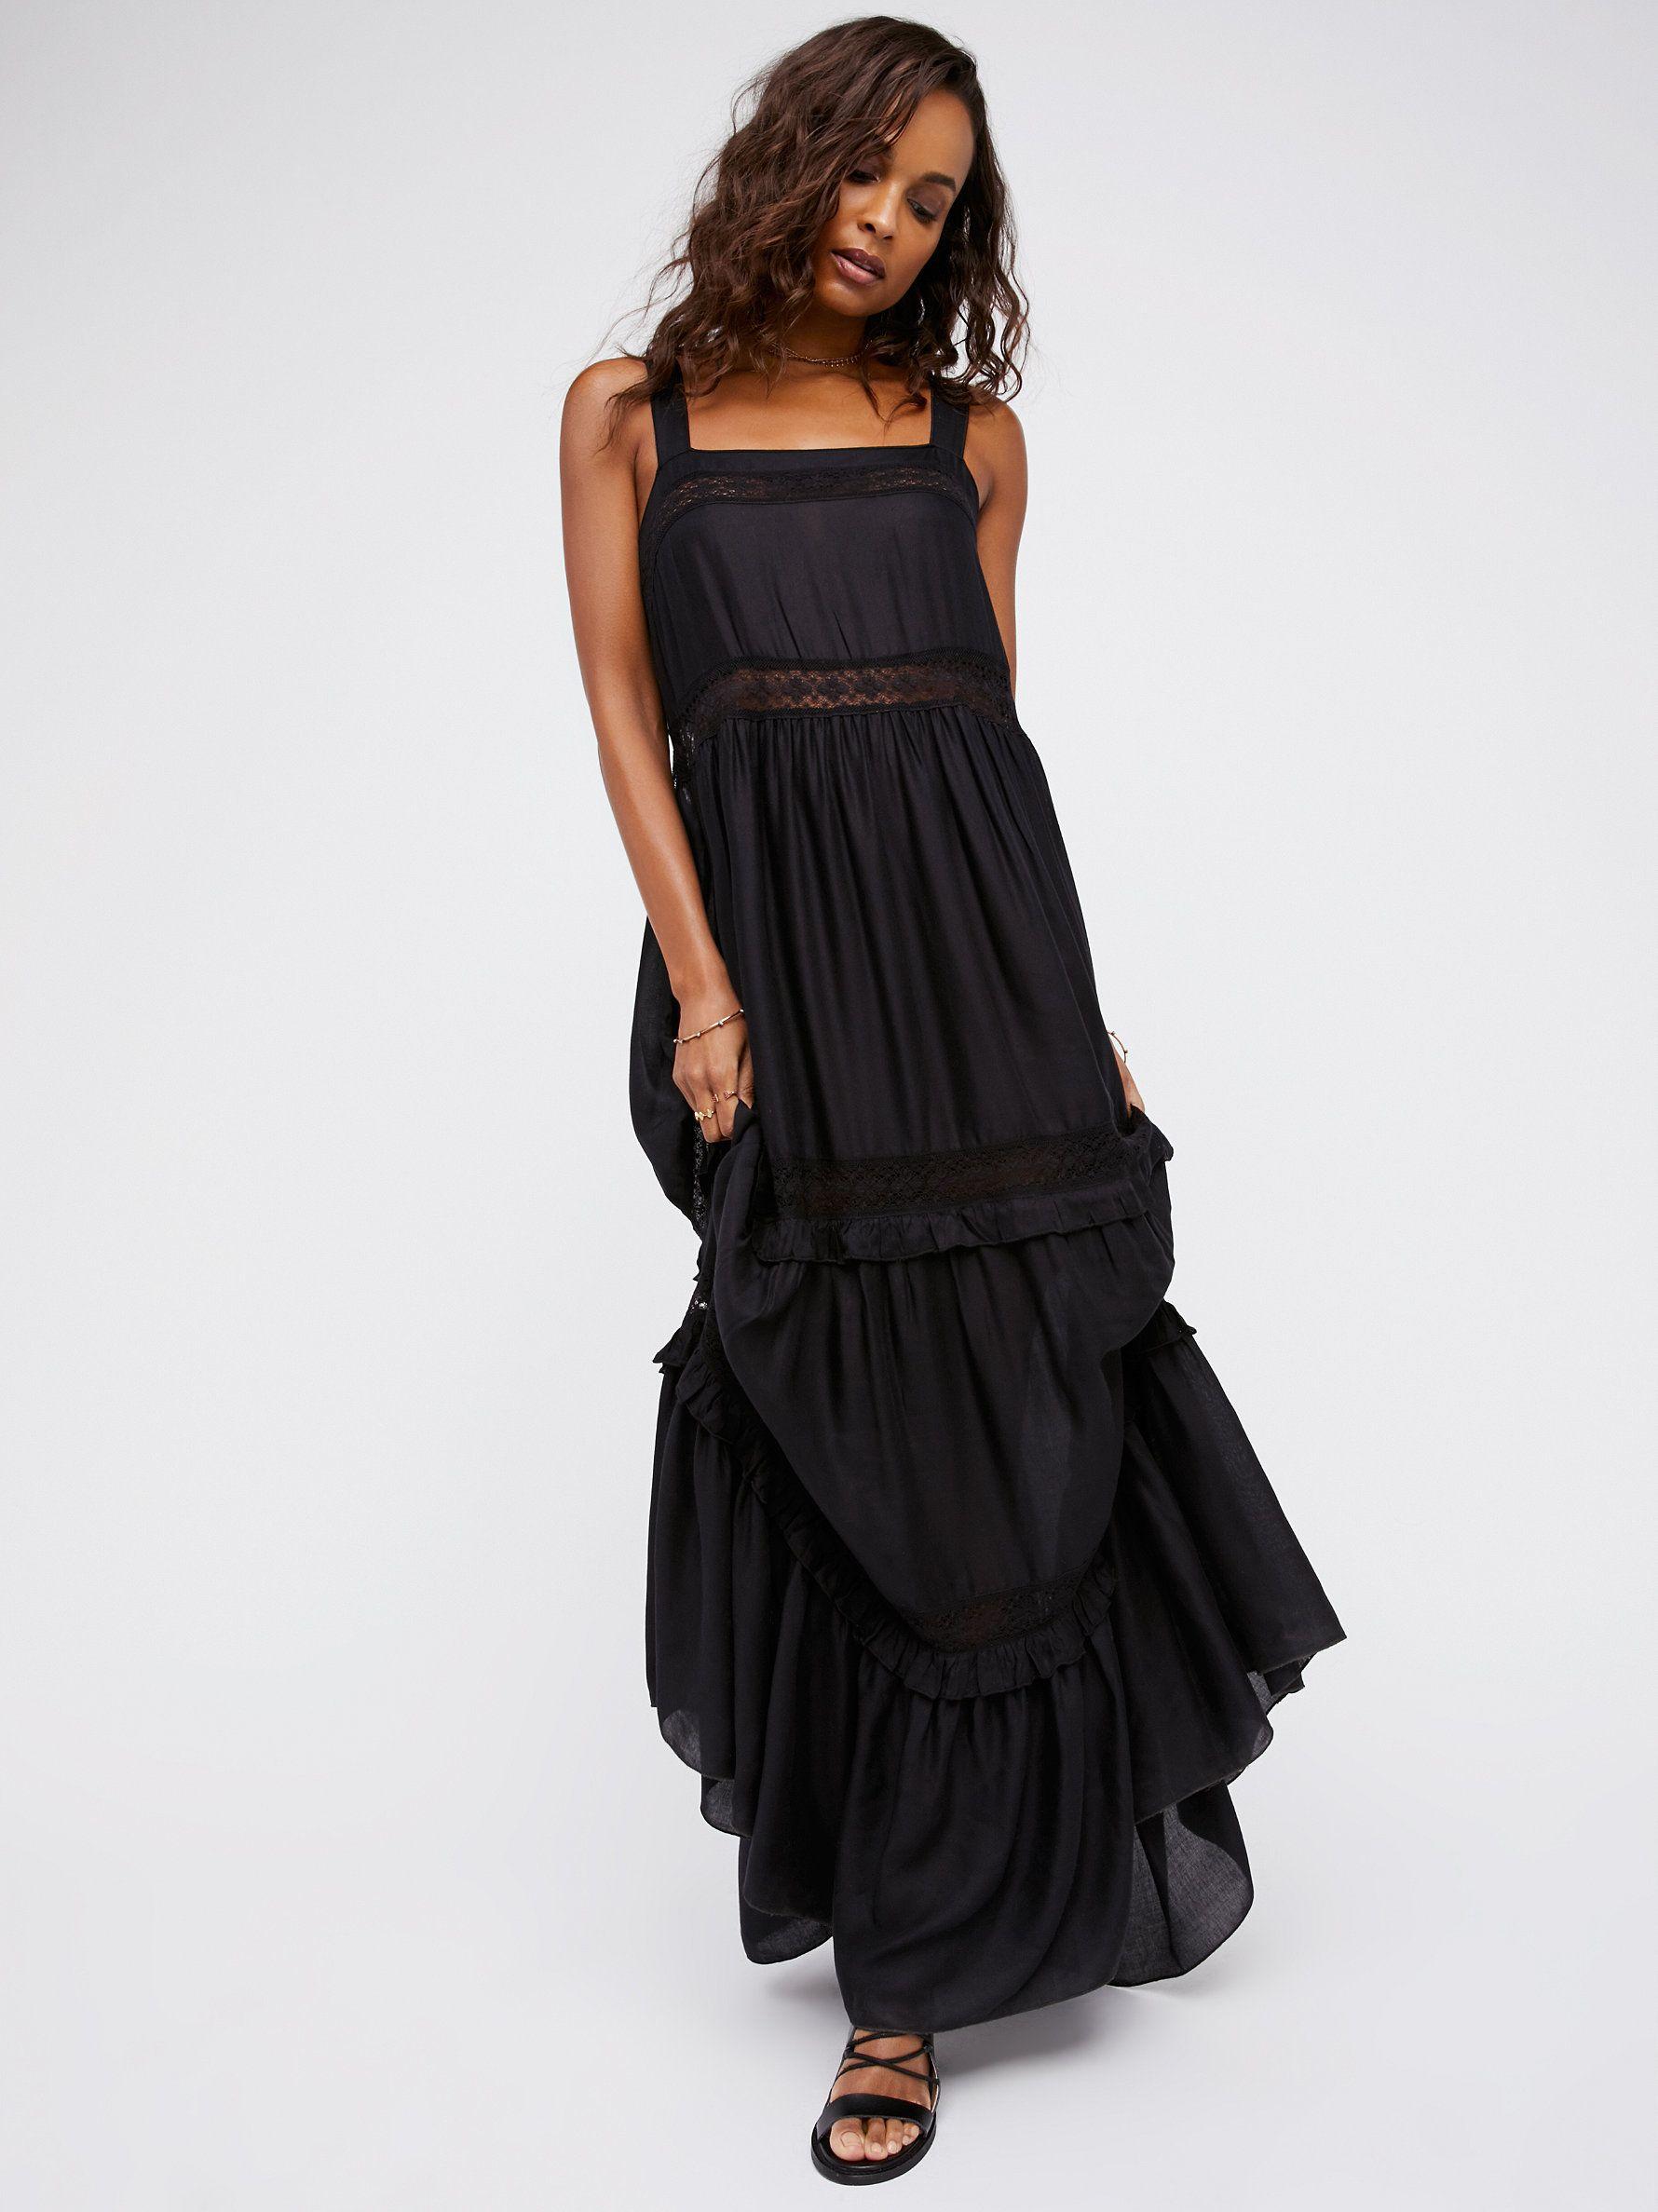 ce5311149f9 Flowy Lace Bridesmaid Dresses